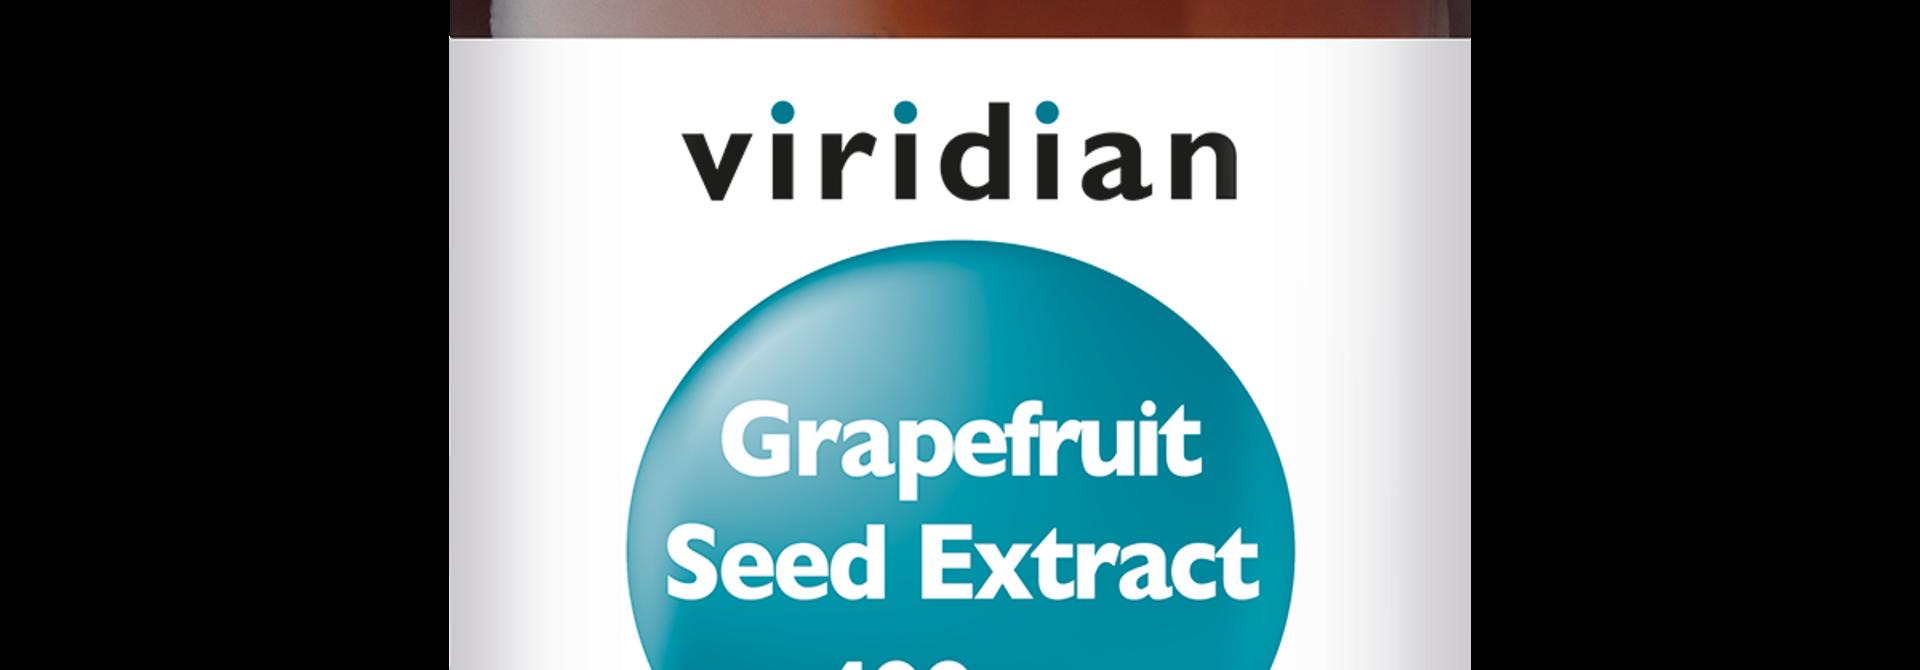 Grapefruit Seed Extract 400 mg 90 plantaardige capsules